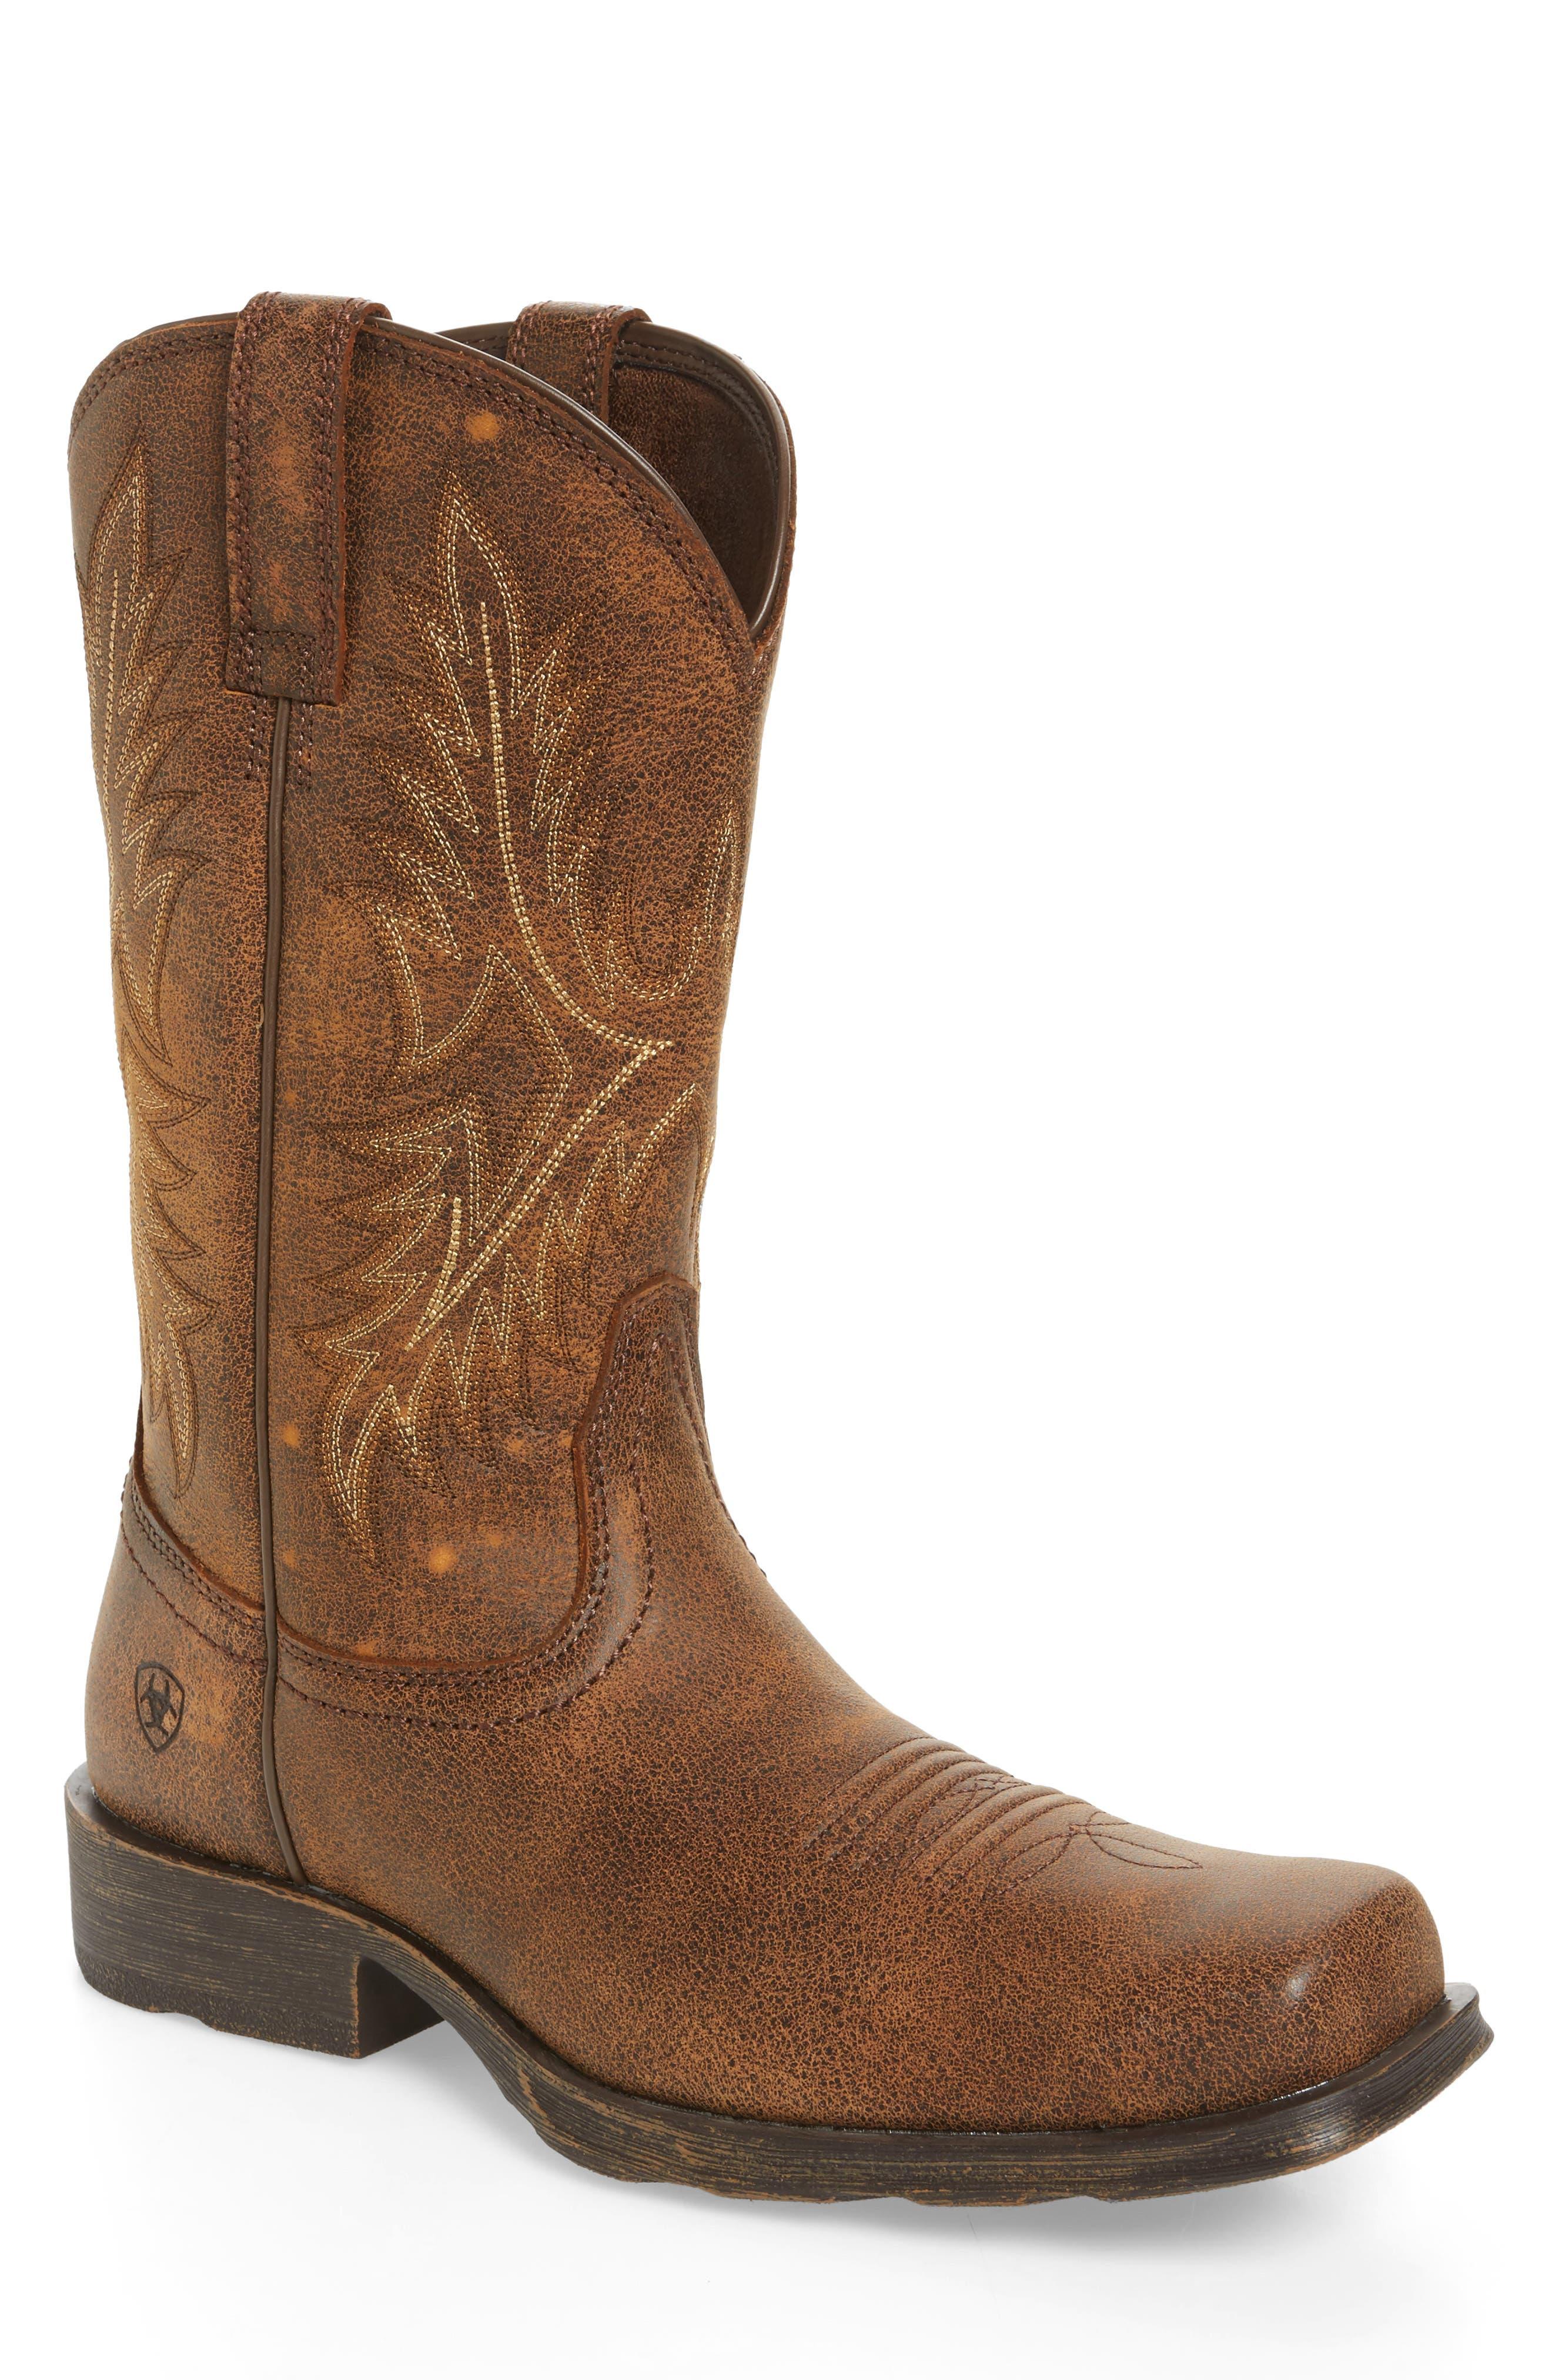 Western Rambler Cowboy Boot,                             Main thumbnail 1, color,                             Vintage Bomber Leather